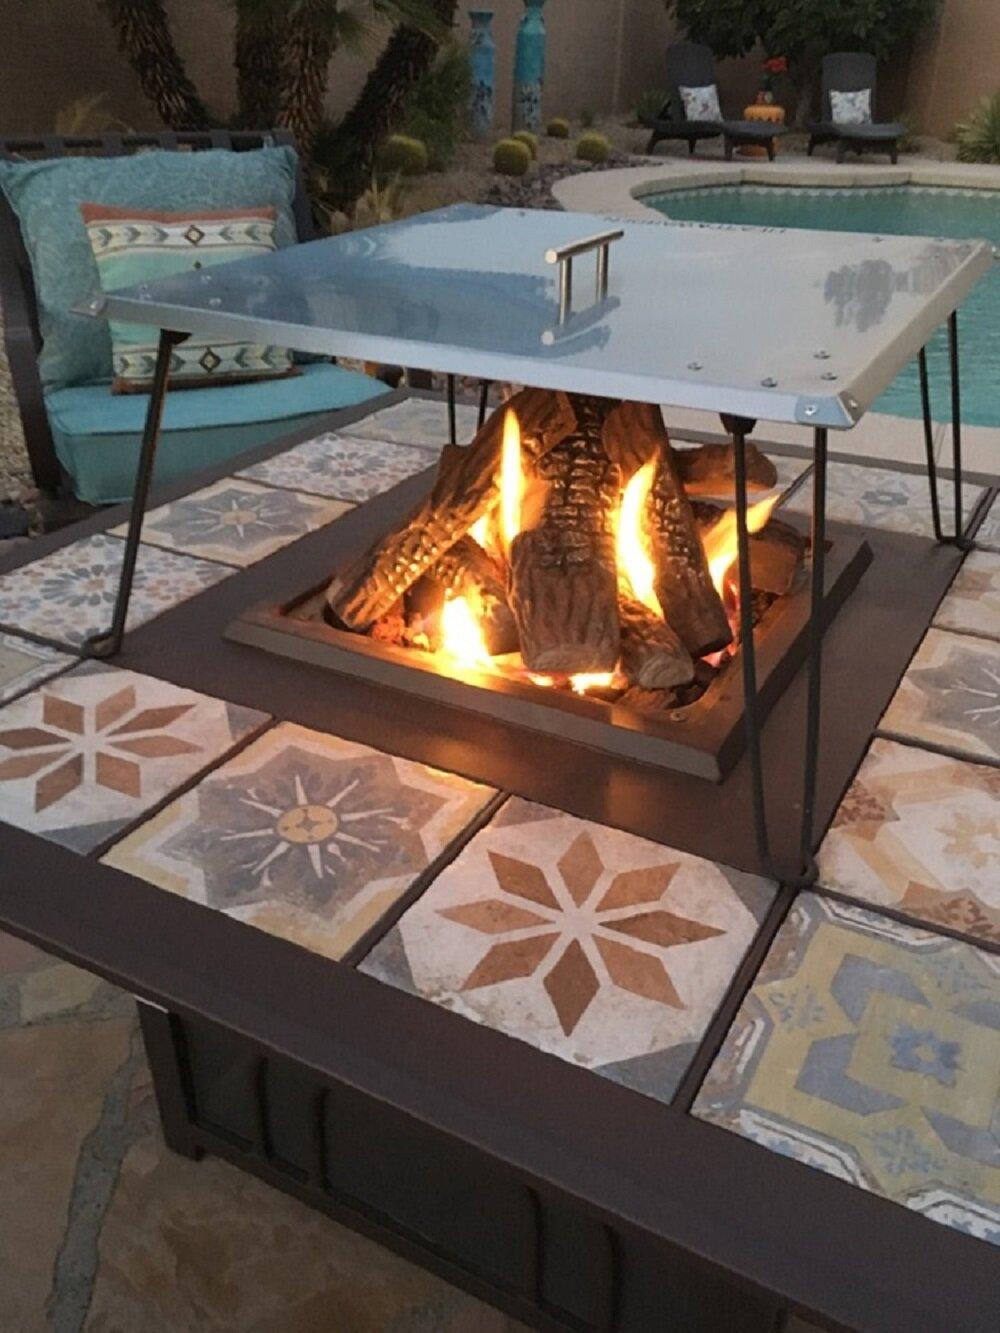 Az Patio Heaters Heatt Warden Fire Pit Heat Deflector Reviews Wayfair